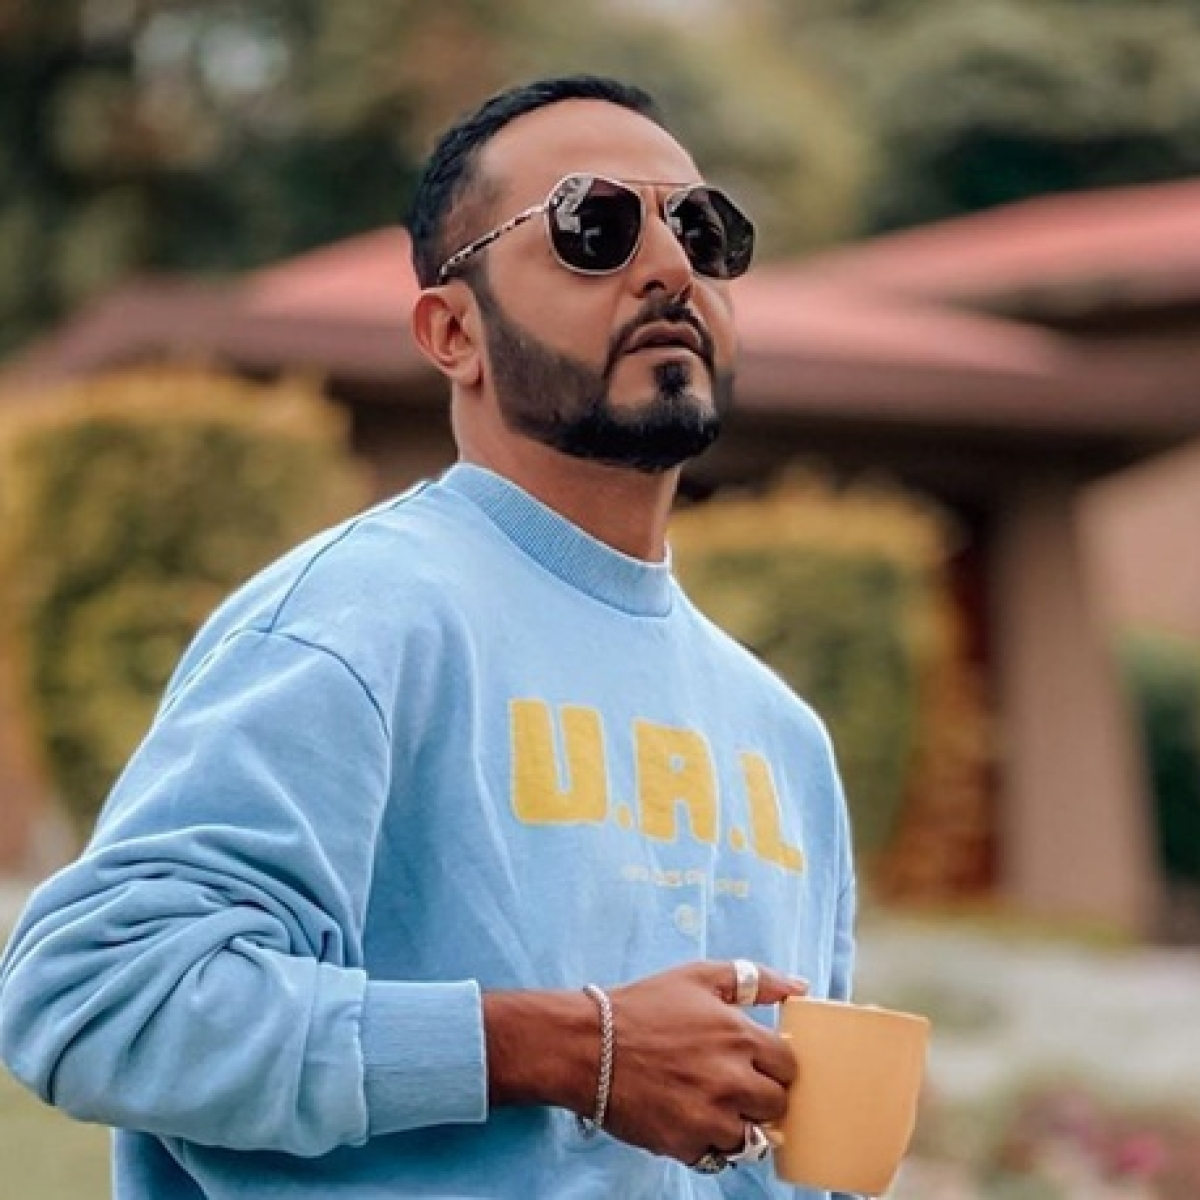 #BoyCottRoadies: After Neha Dhupia, Nikhil Chinapa's video calling 'MTV Roadies' contestant 'mot****' goes viral